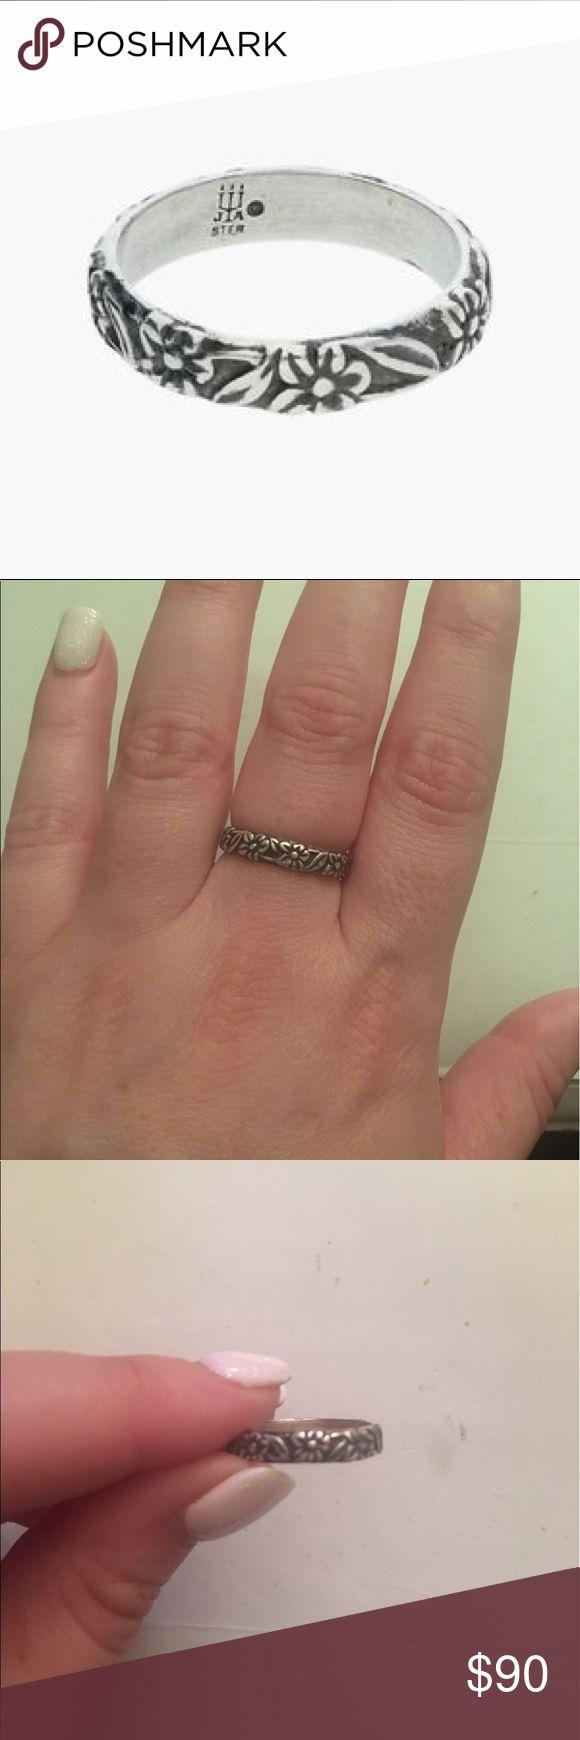 james avery rings james avery wedding bands James Avery retired flower ring Sz 6 5